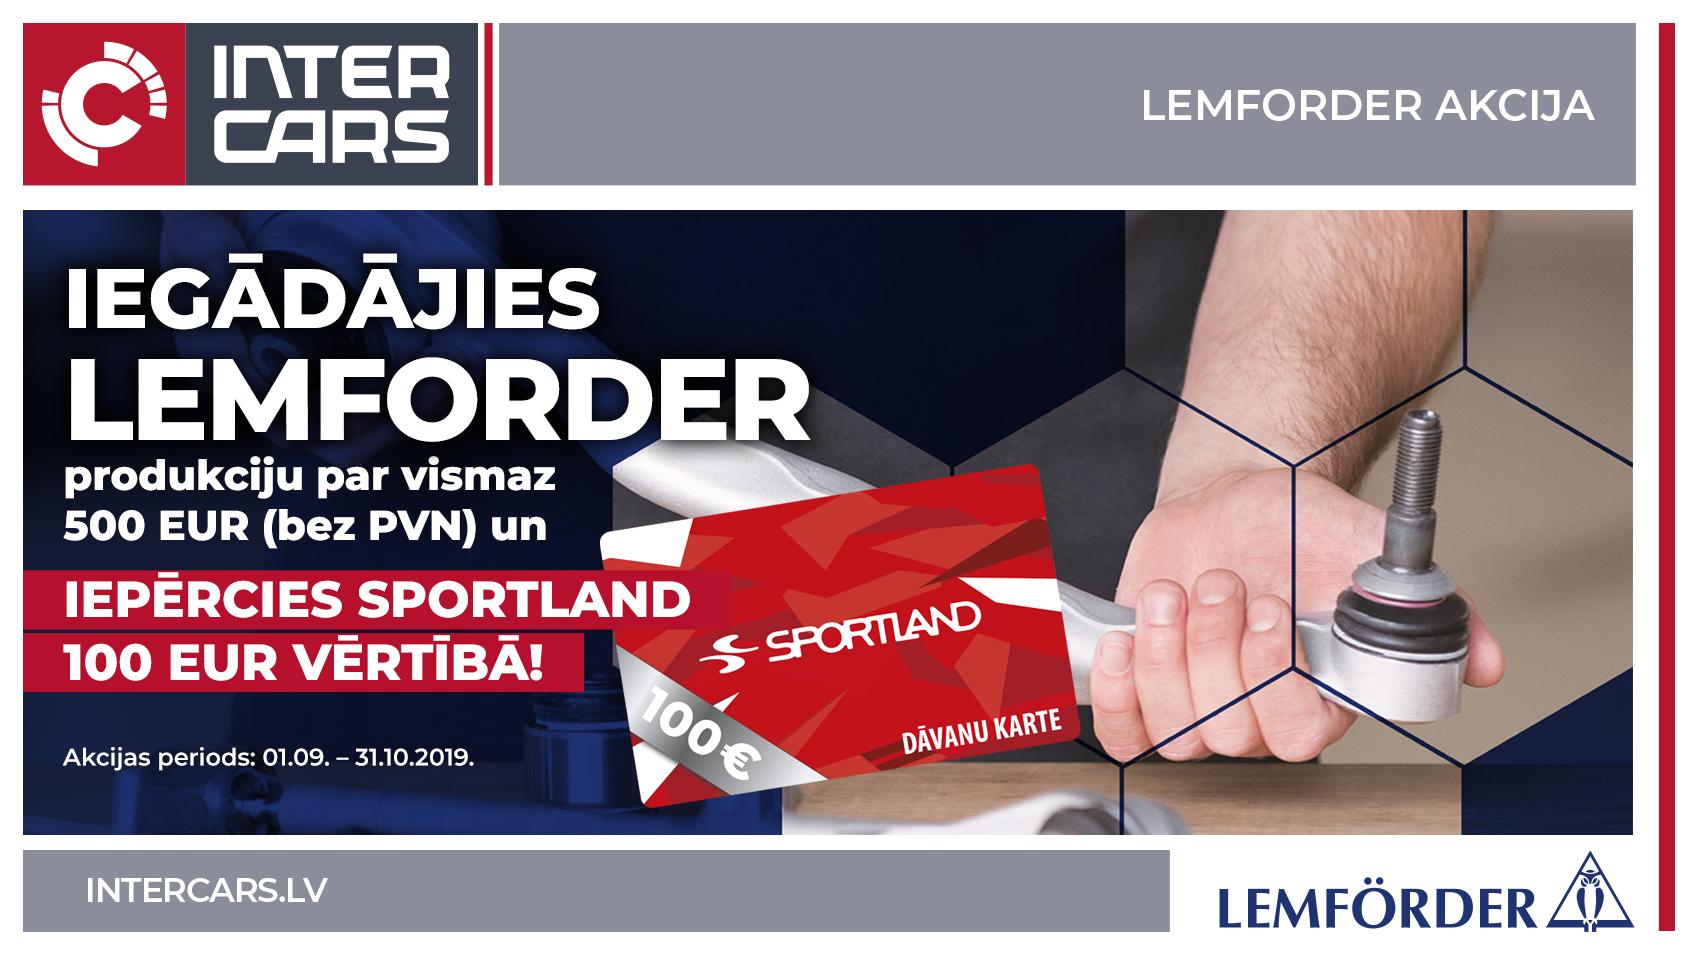 Lemforder-akcija-sept2019screen.jpg